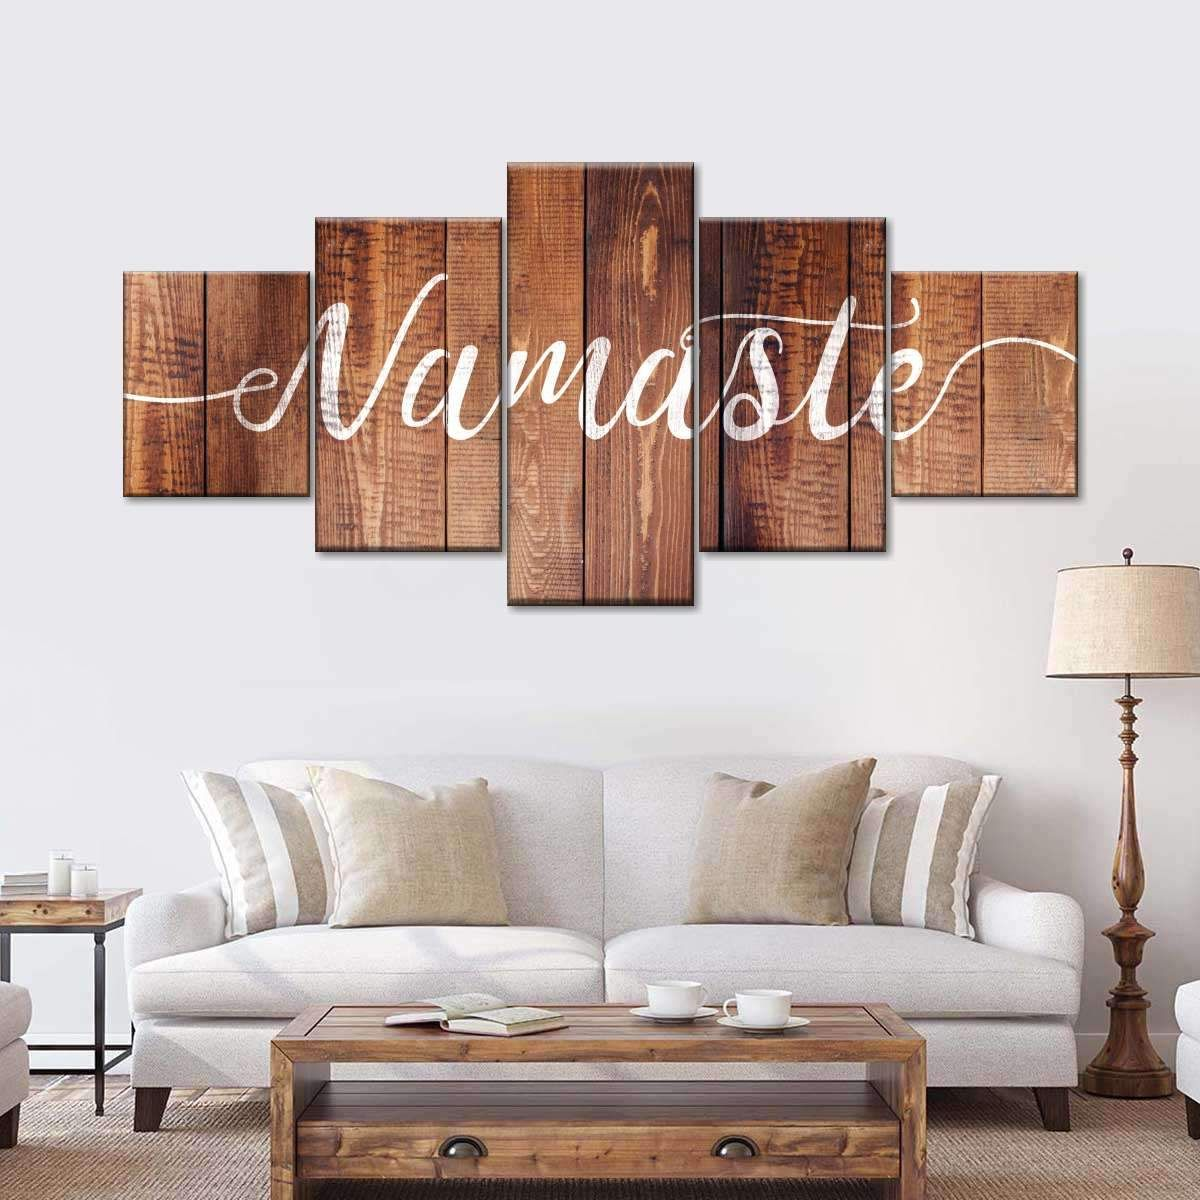 Namaste On Wood Multi Panel Canvas Wall Art Home Decor Wall Art Wall Decor Living Room Family Wall Art